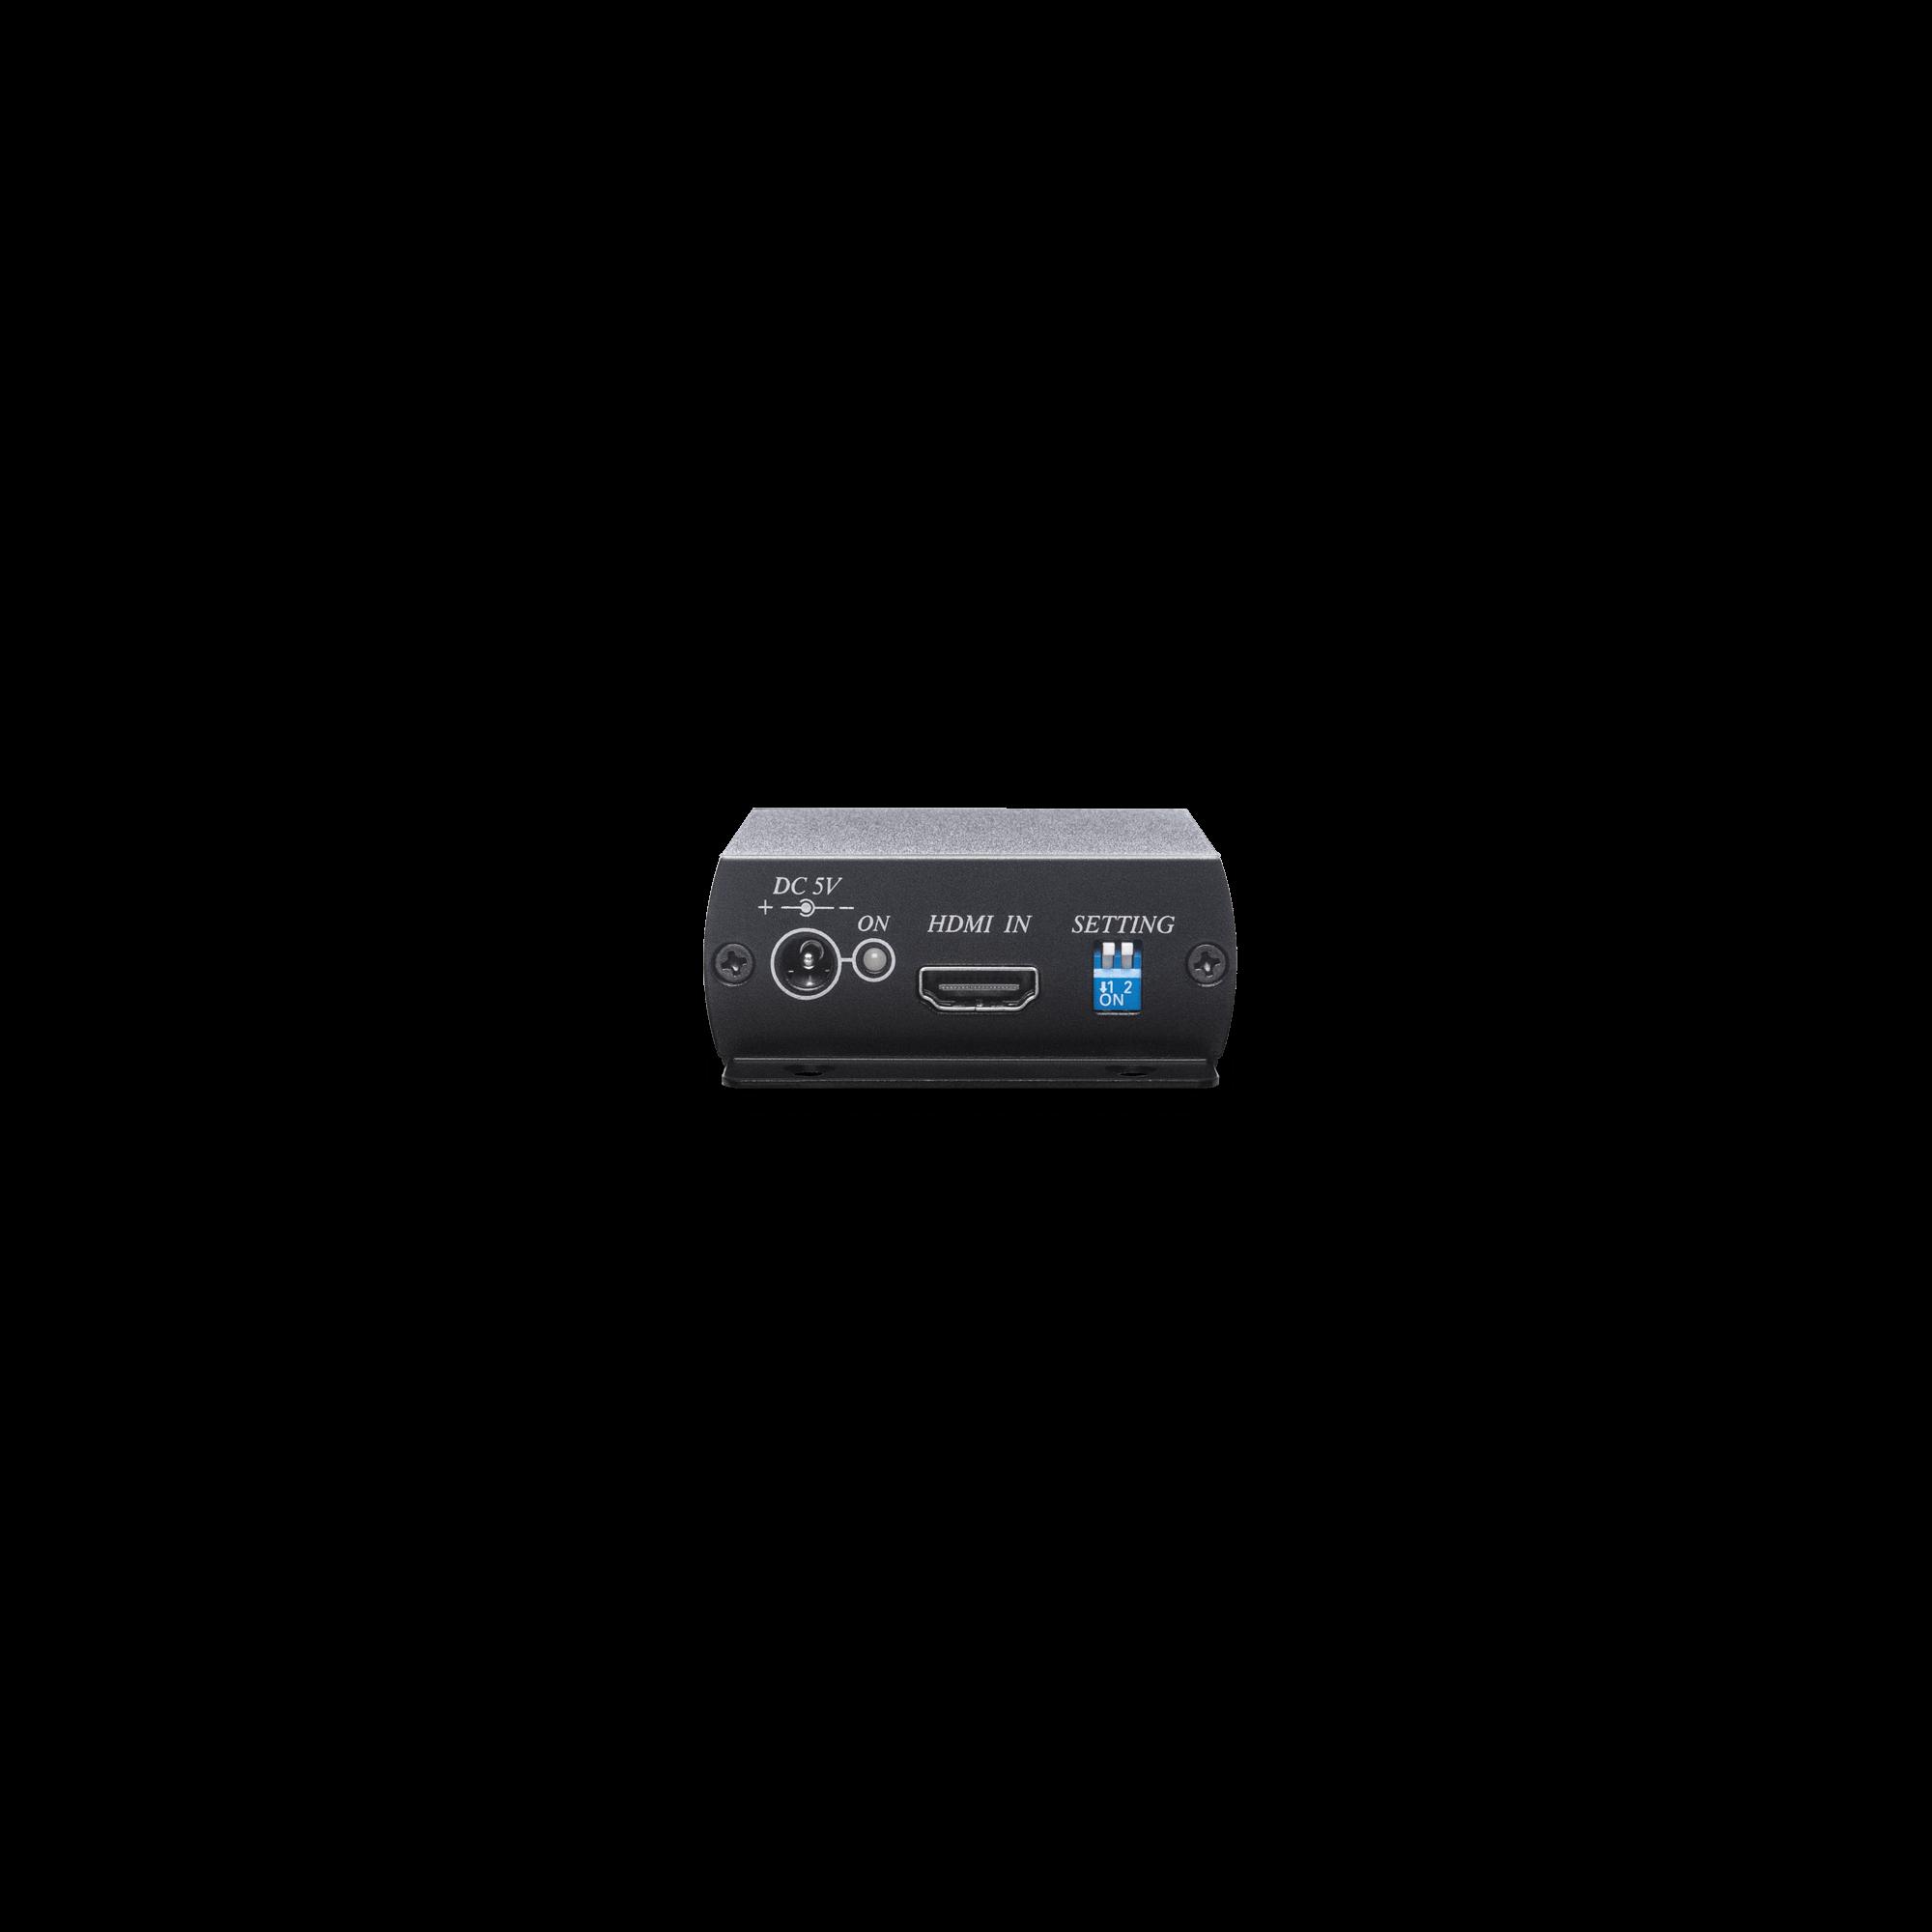 HDMI CAT5e Extender-Single CAT5e cable 1080p 50M